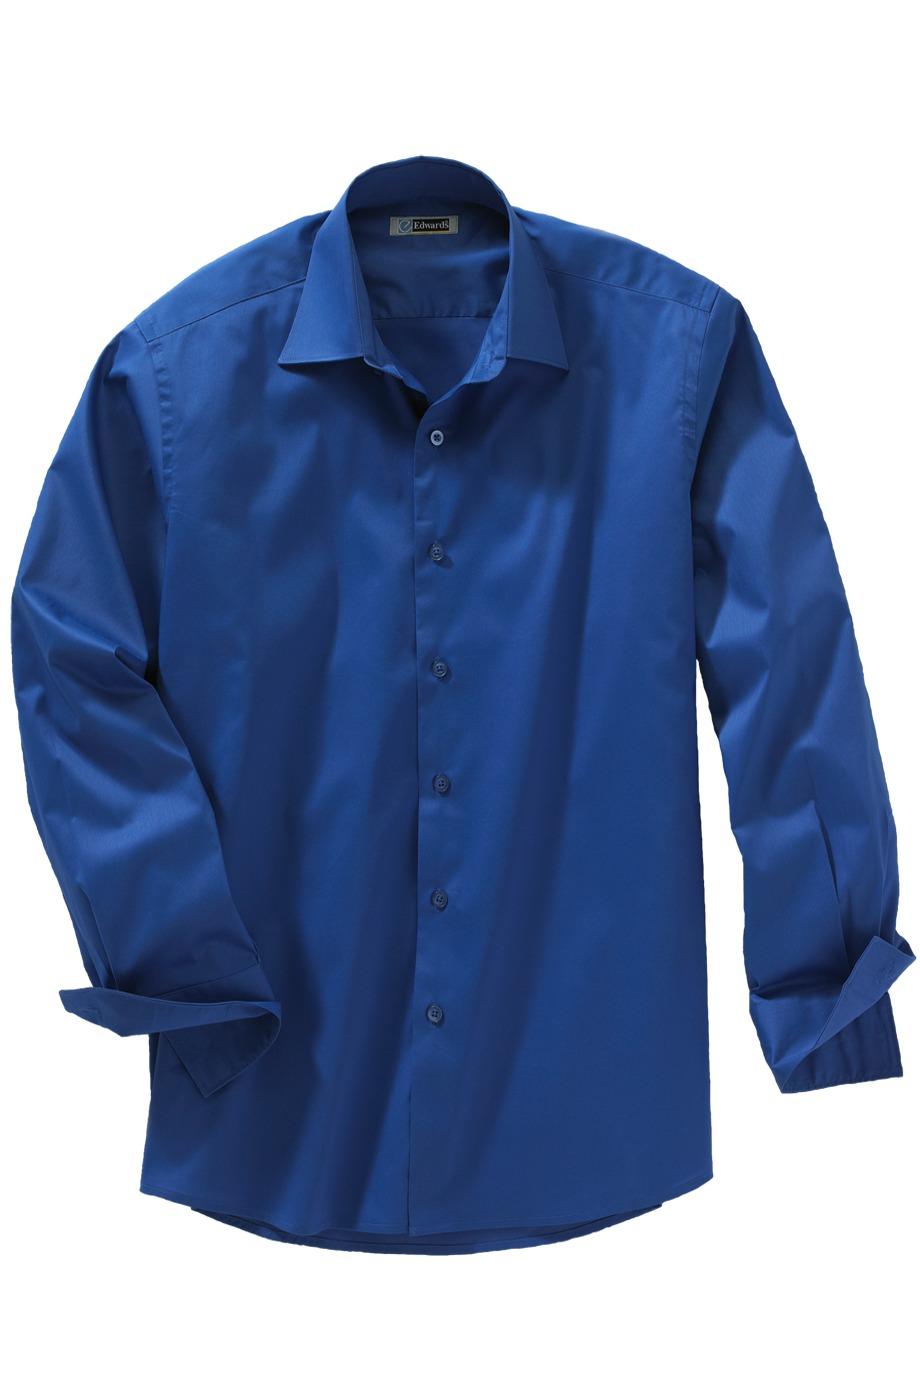 e08bb53c9 Edwards Garment 1033 - Spread Collar Dress Shirt $26.80 - Men's Woven Shirts